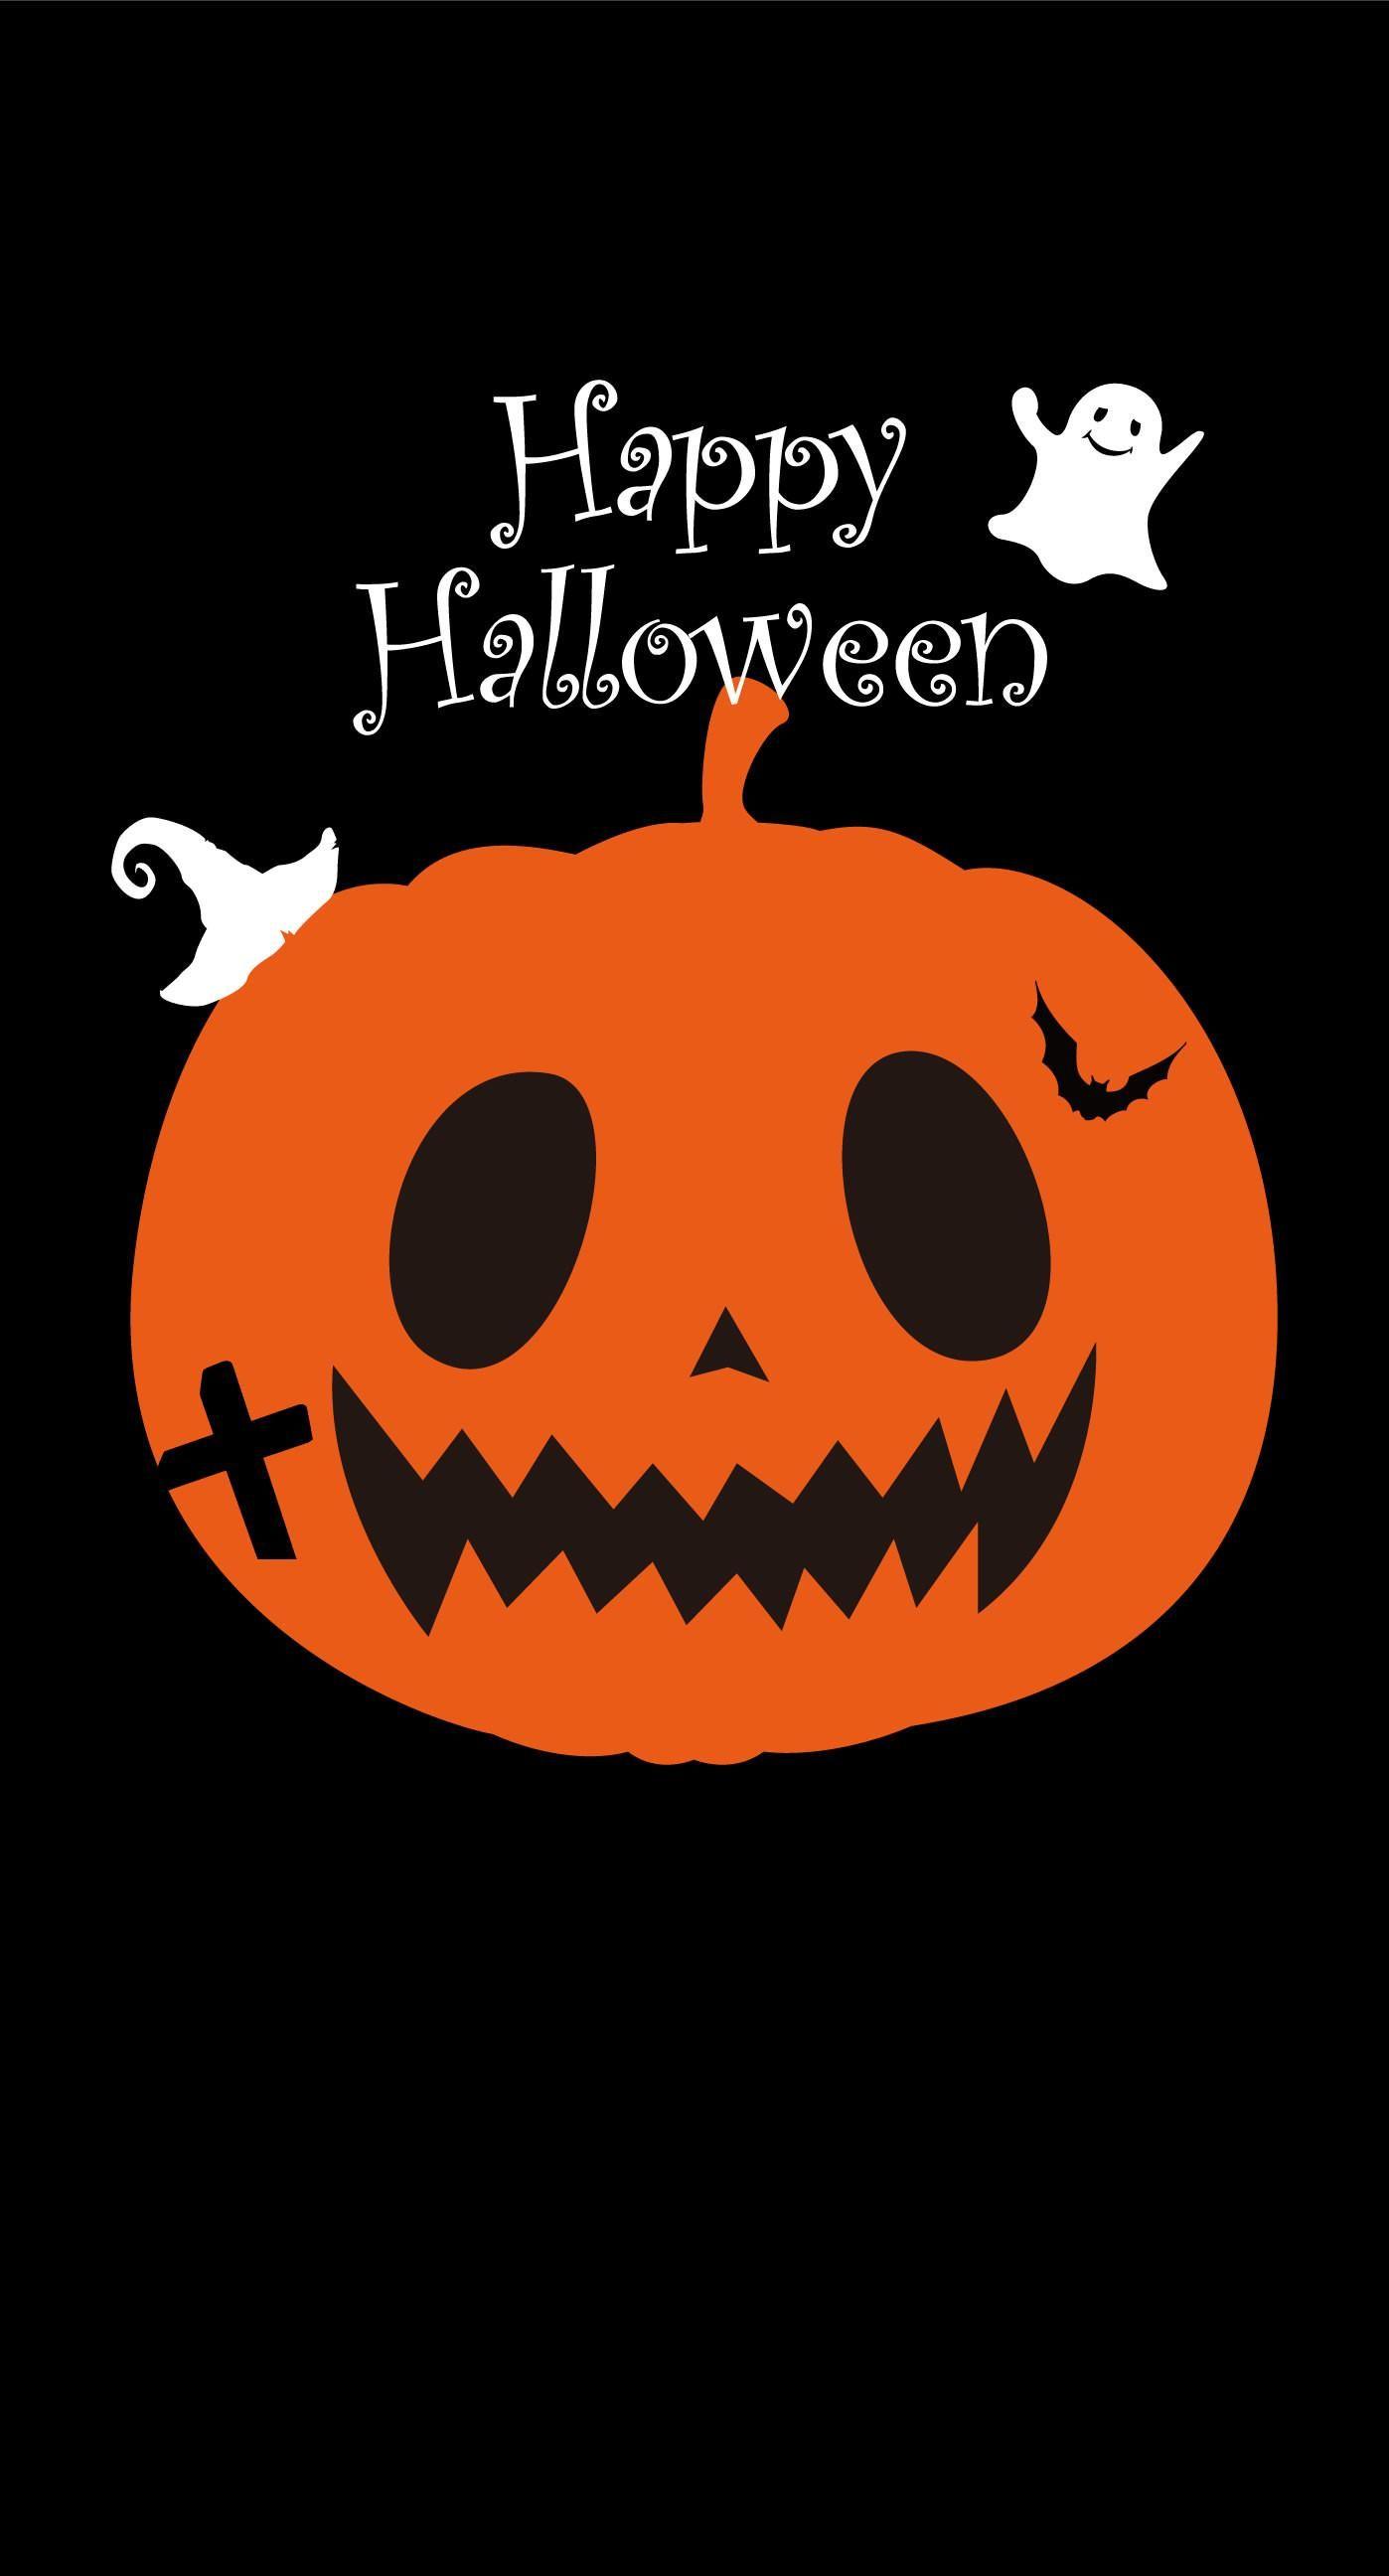 Live Halloween Wallpaper For Iphone 73 Images Halloween